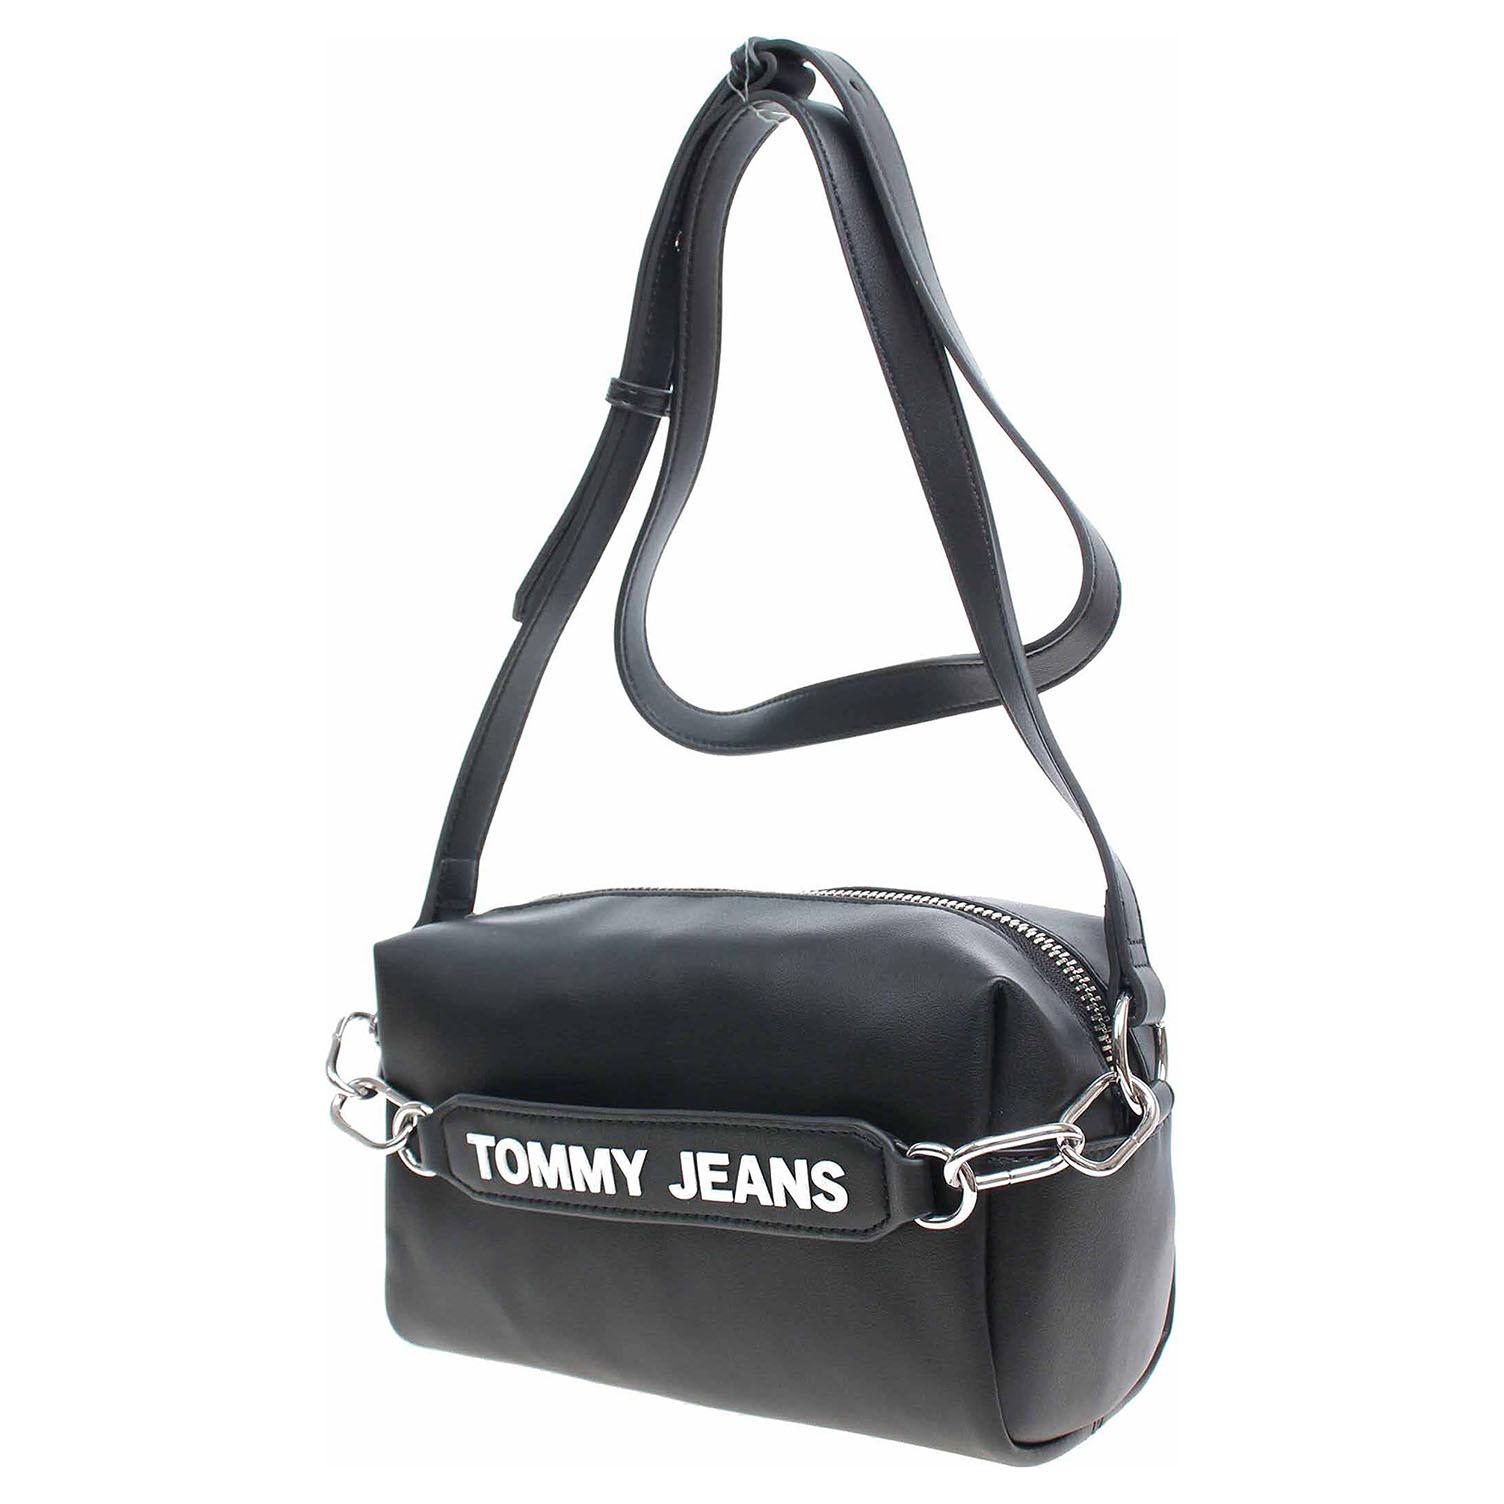 Ecco Tommy Hilfiger dámská kabelka AW0AW06537 002 black 11891497 5e79e27f53f